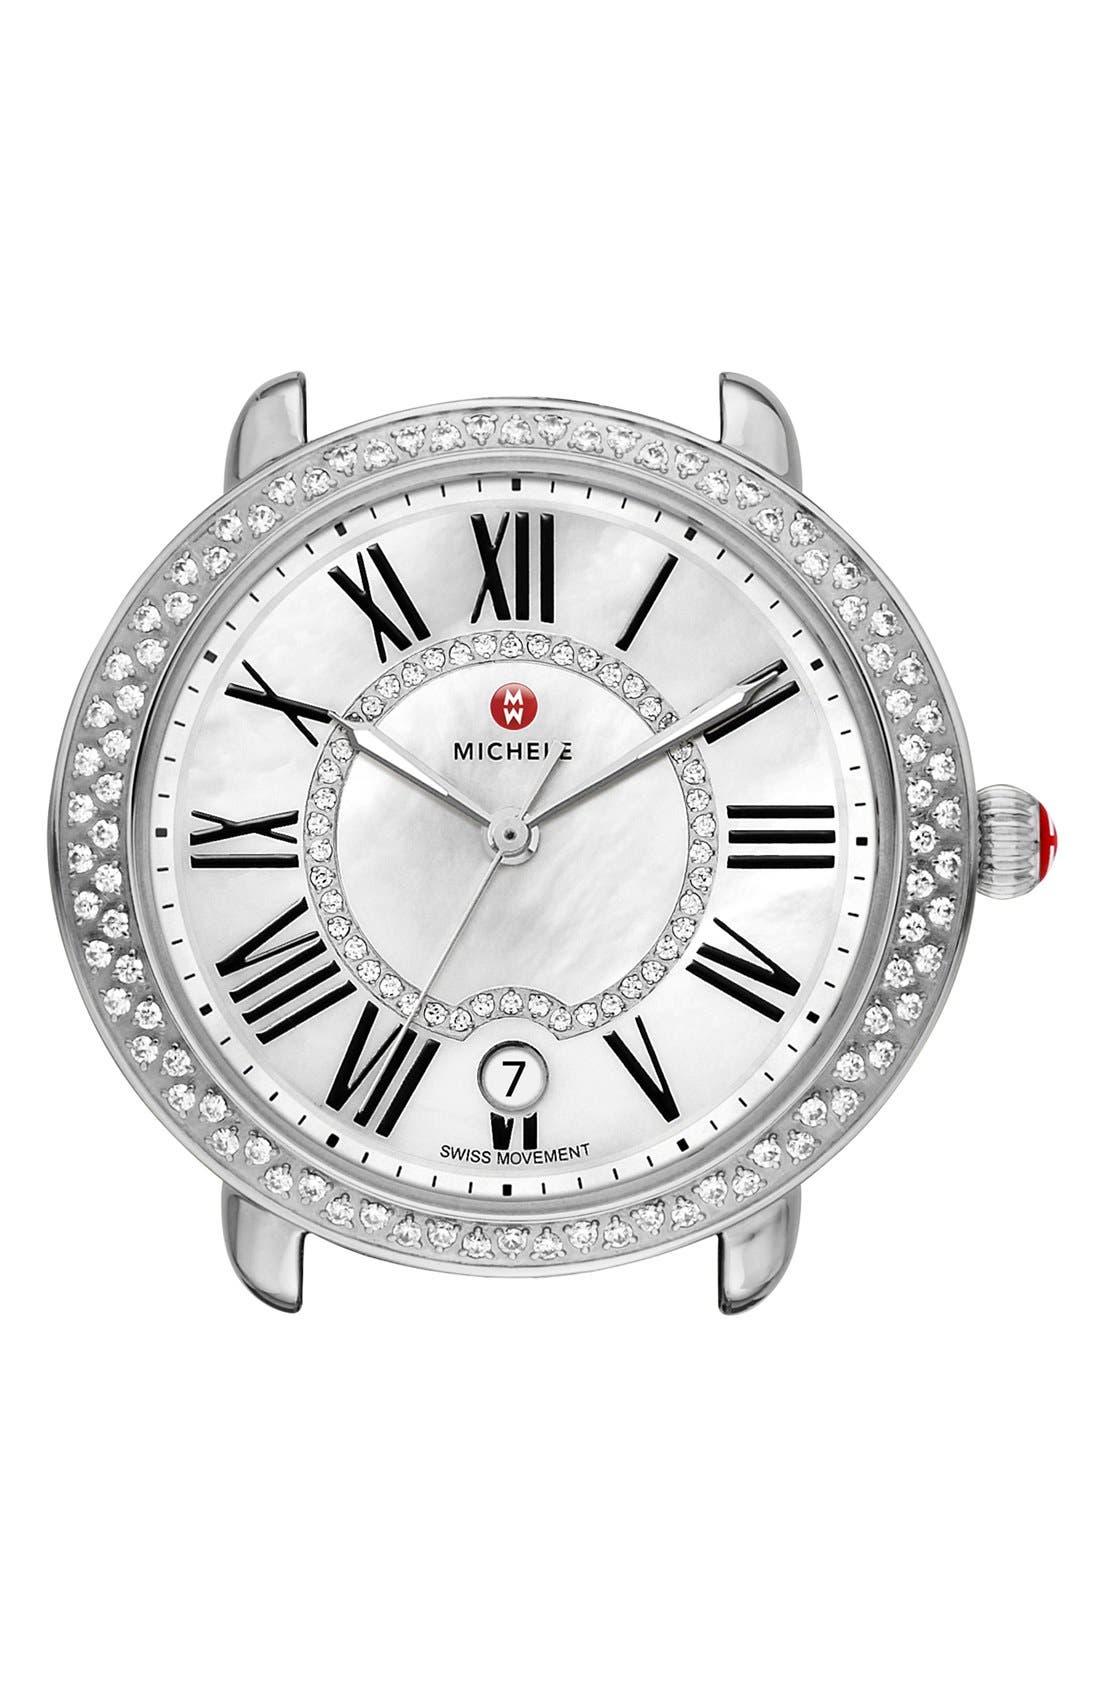 Main Image - MICHELE Serein 16 Diamond Watch Case, 34mm x 36mm